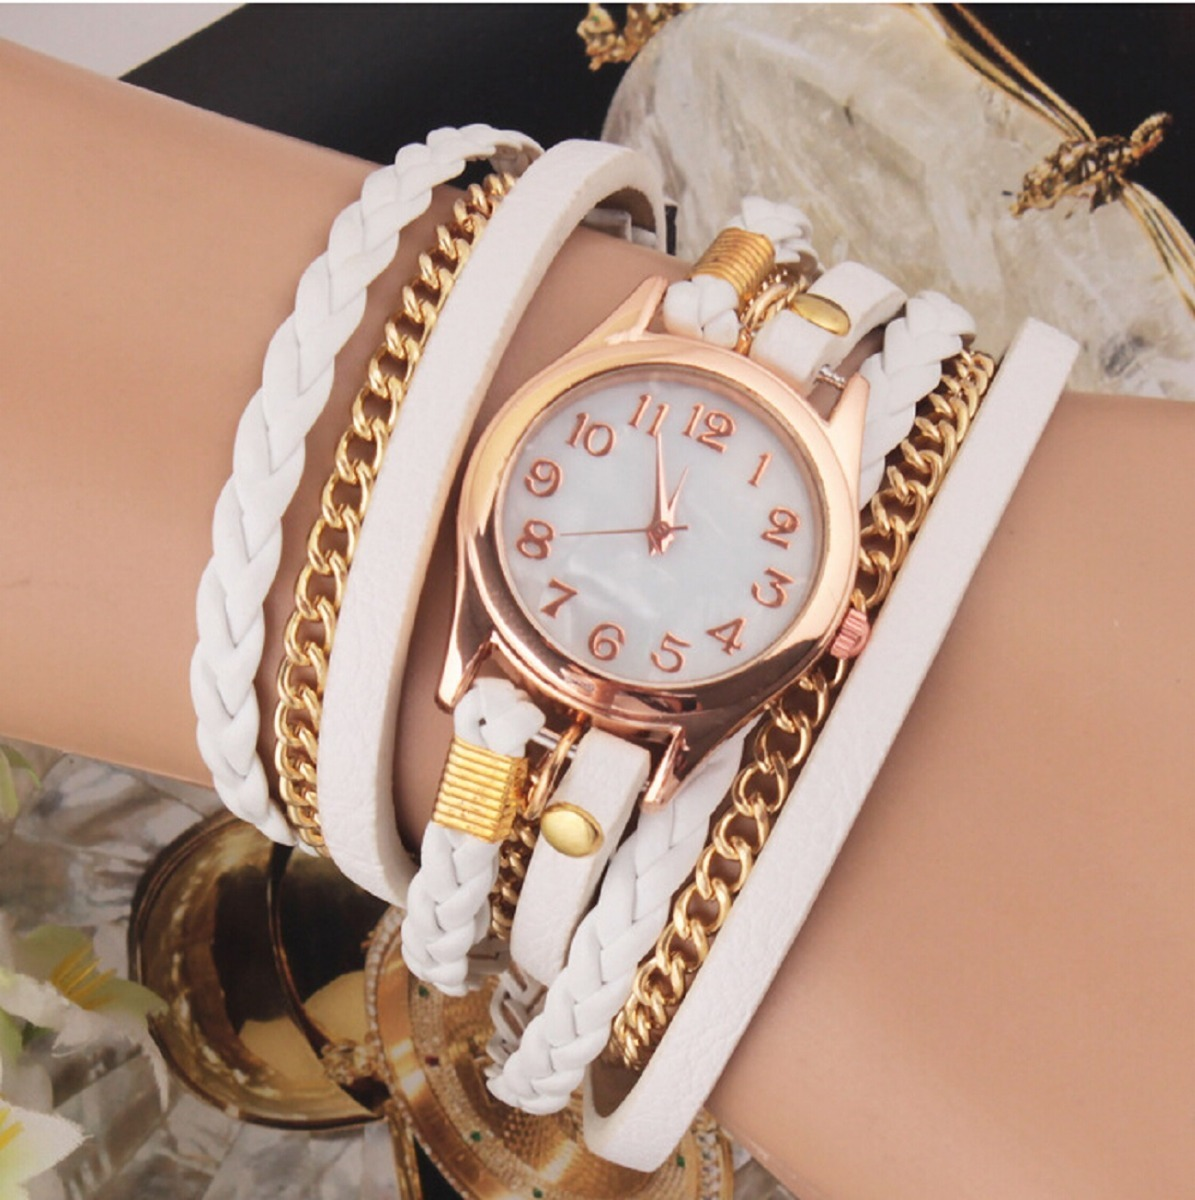 d262964aa0c relógio feminino retro vintage pulseira de couro. Carregando zoom.